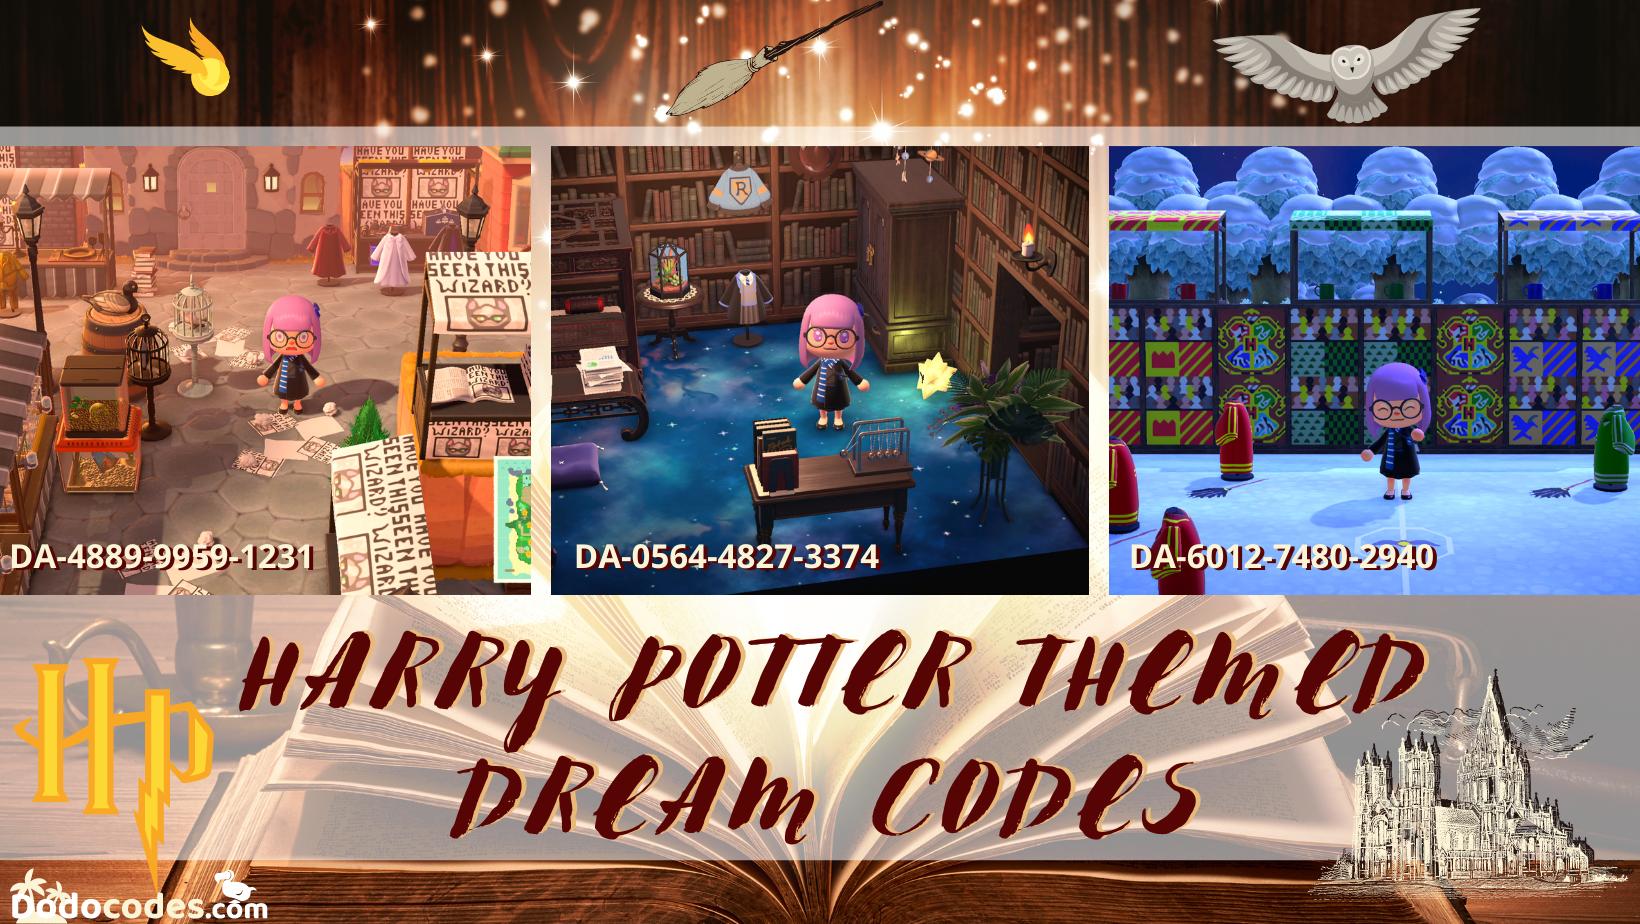 Dodocodes Com Blog Harry Potter Themed Dream Codes